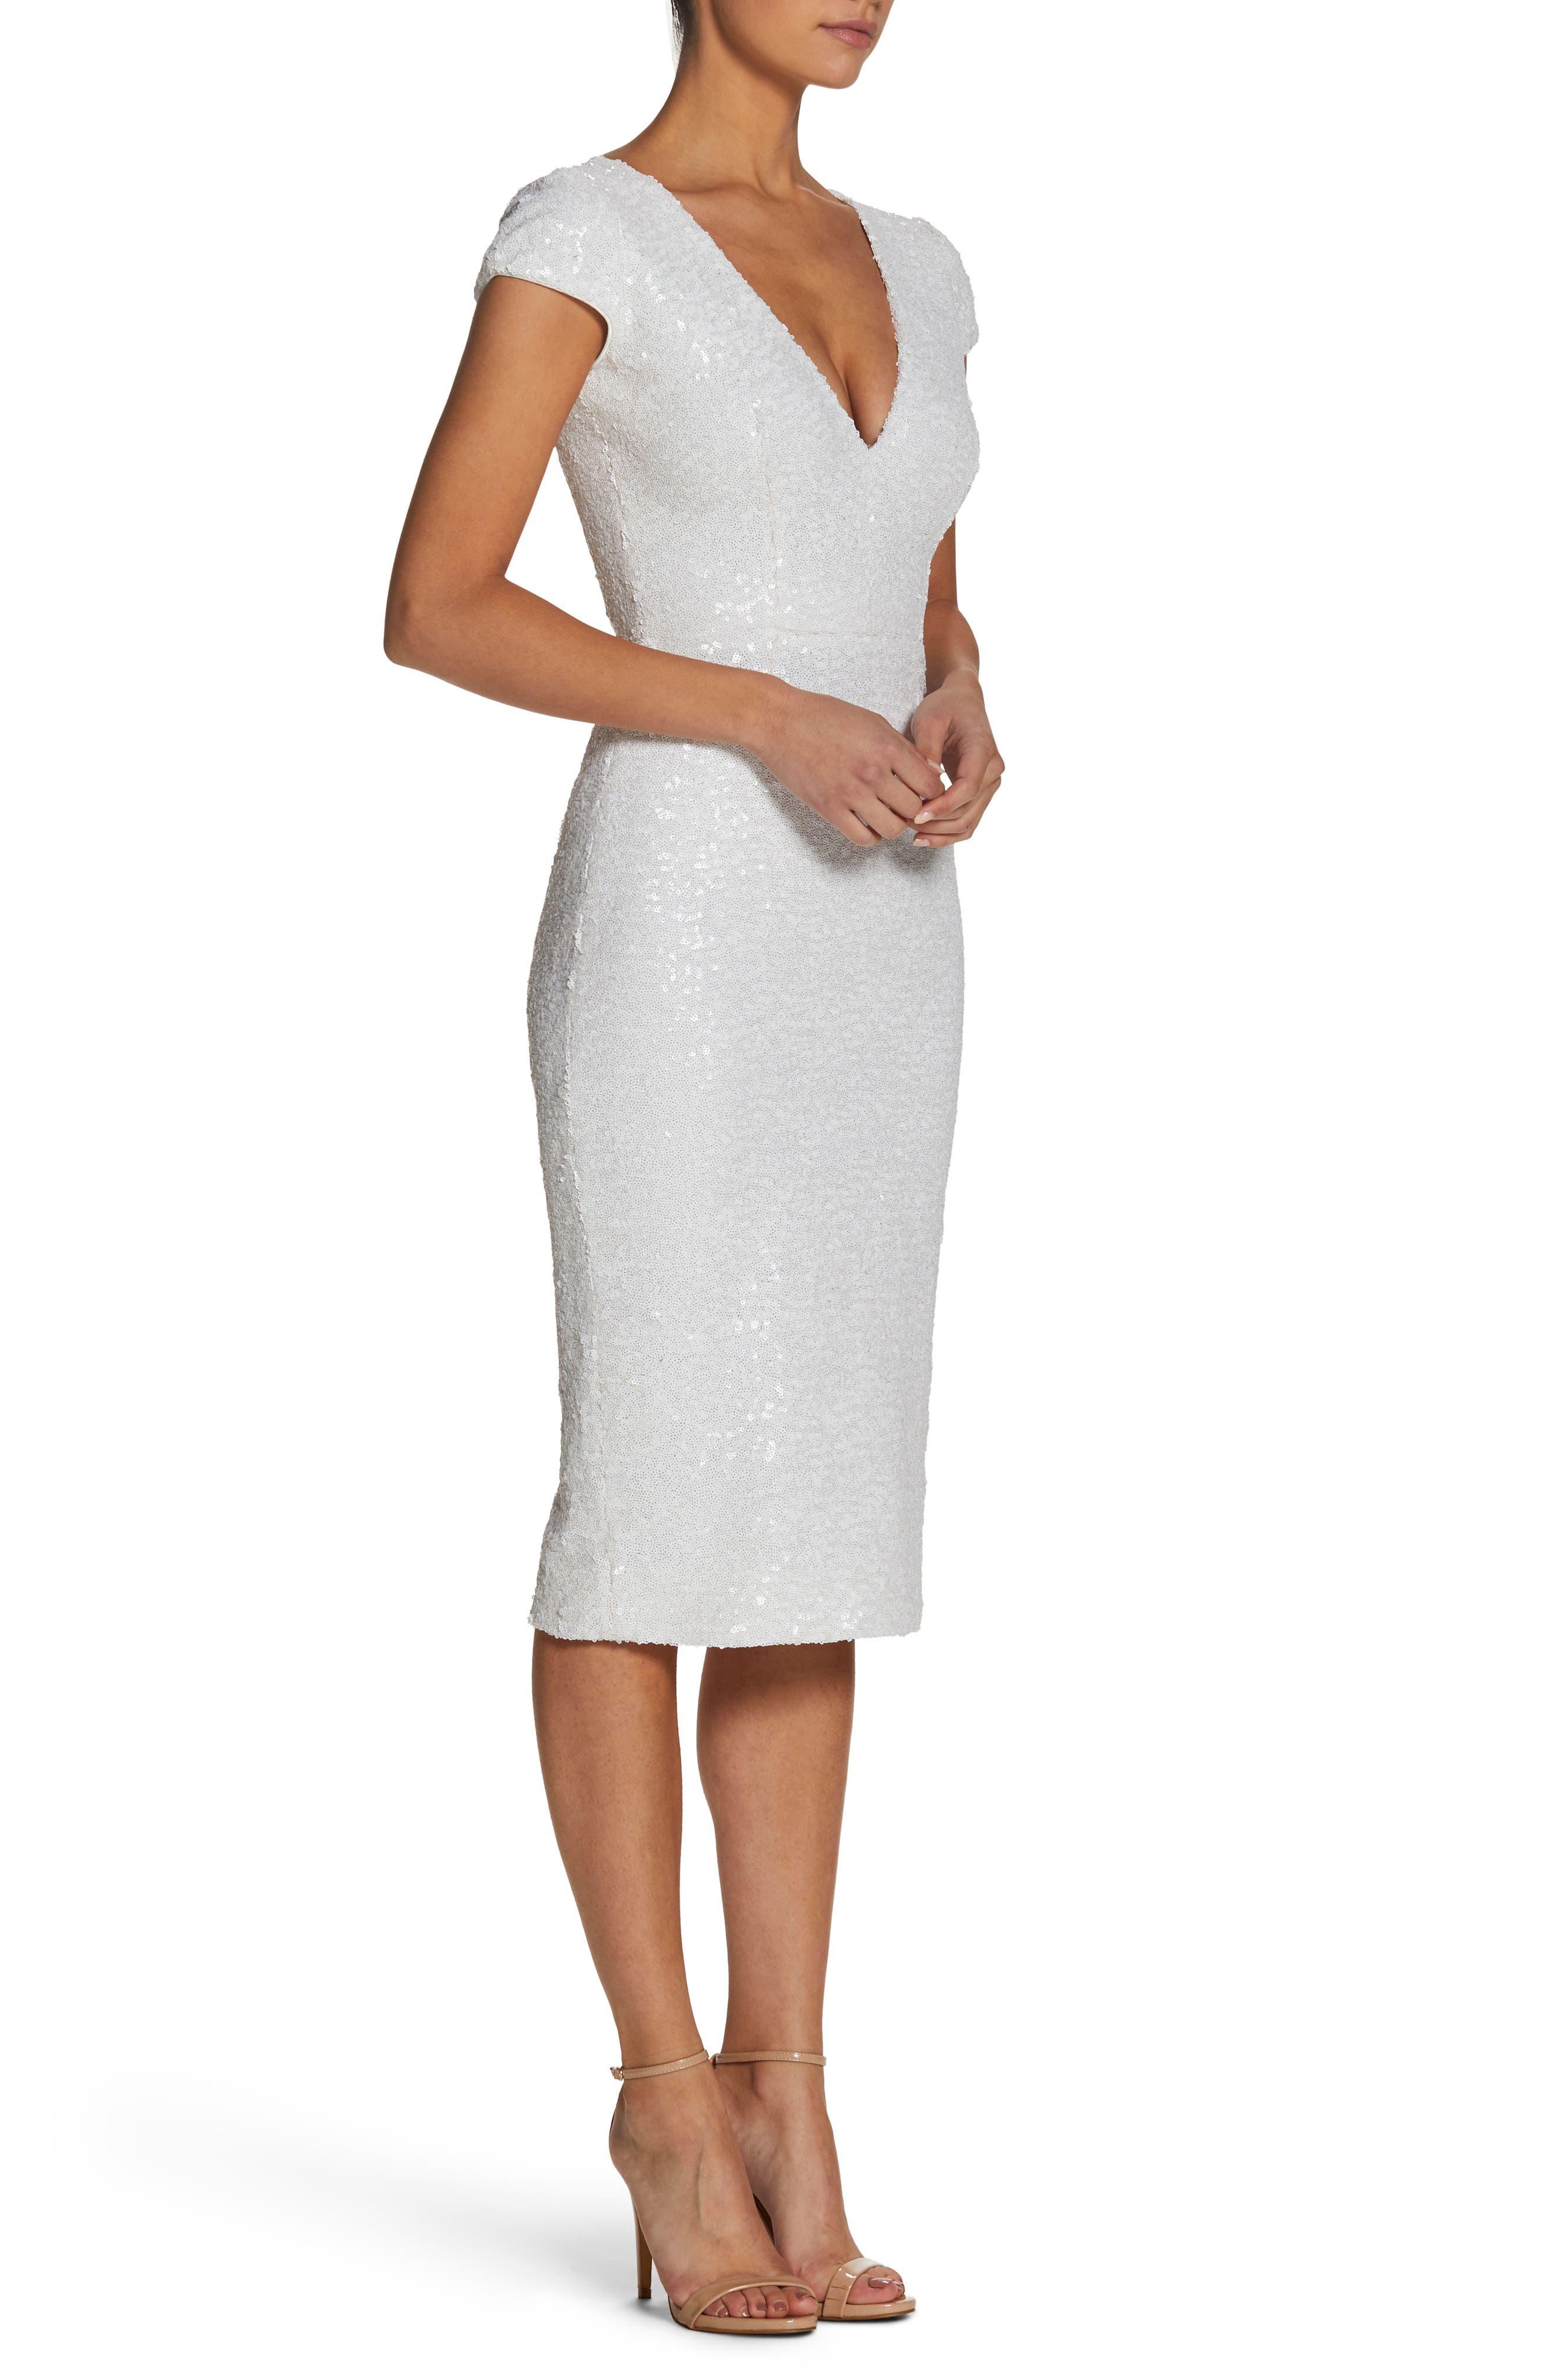 Allison Sequin Sheath Dress,                             Alternate thumbnail 3, color,                             White